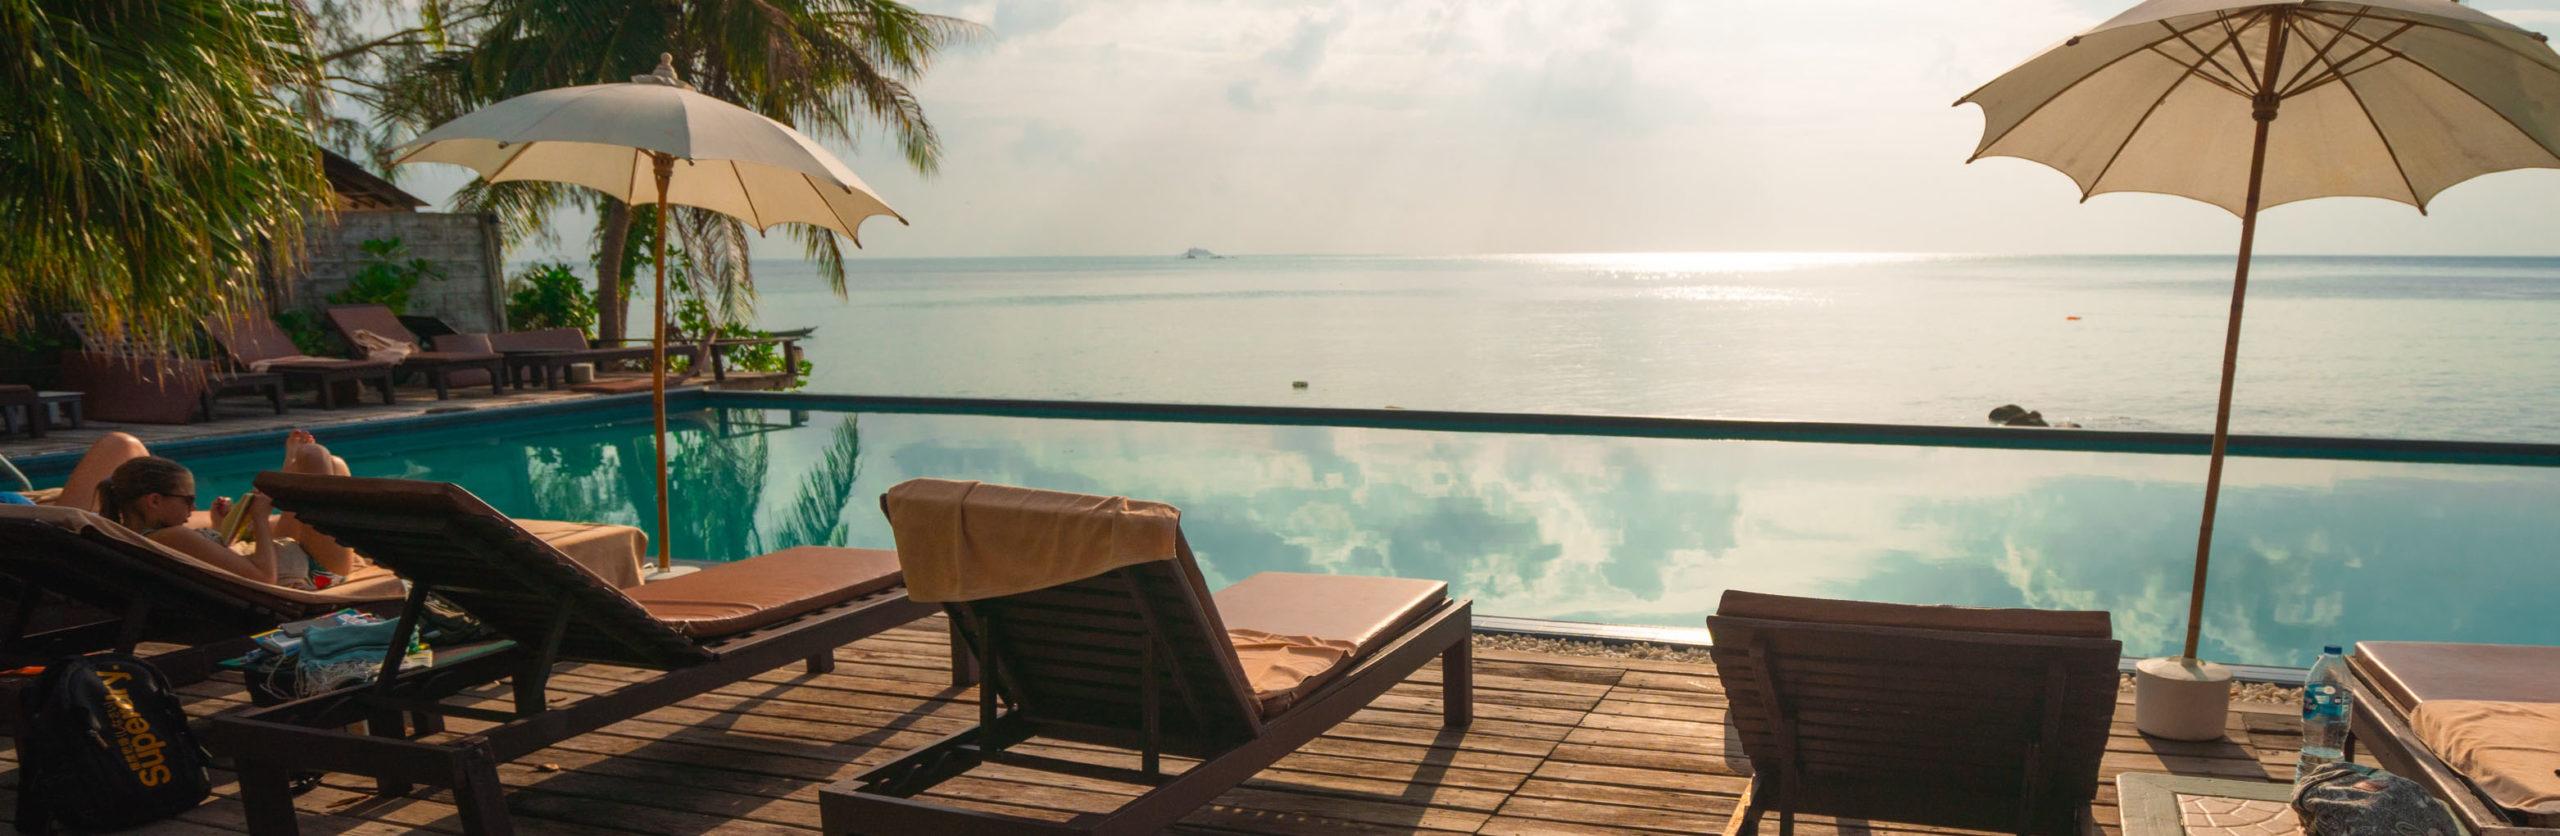 Resort Hacks To Help You Save Big